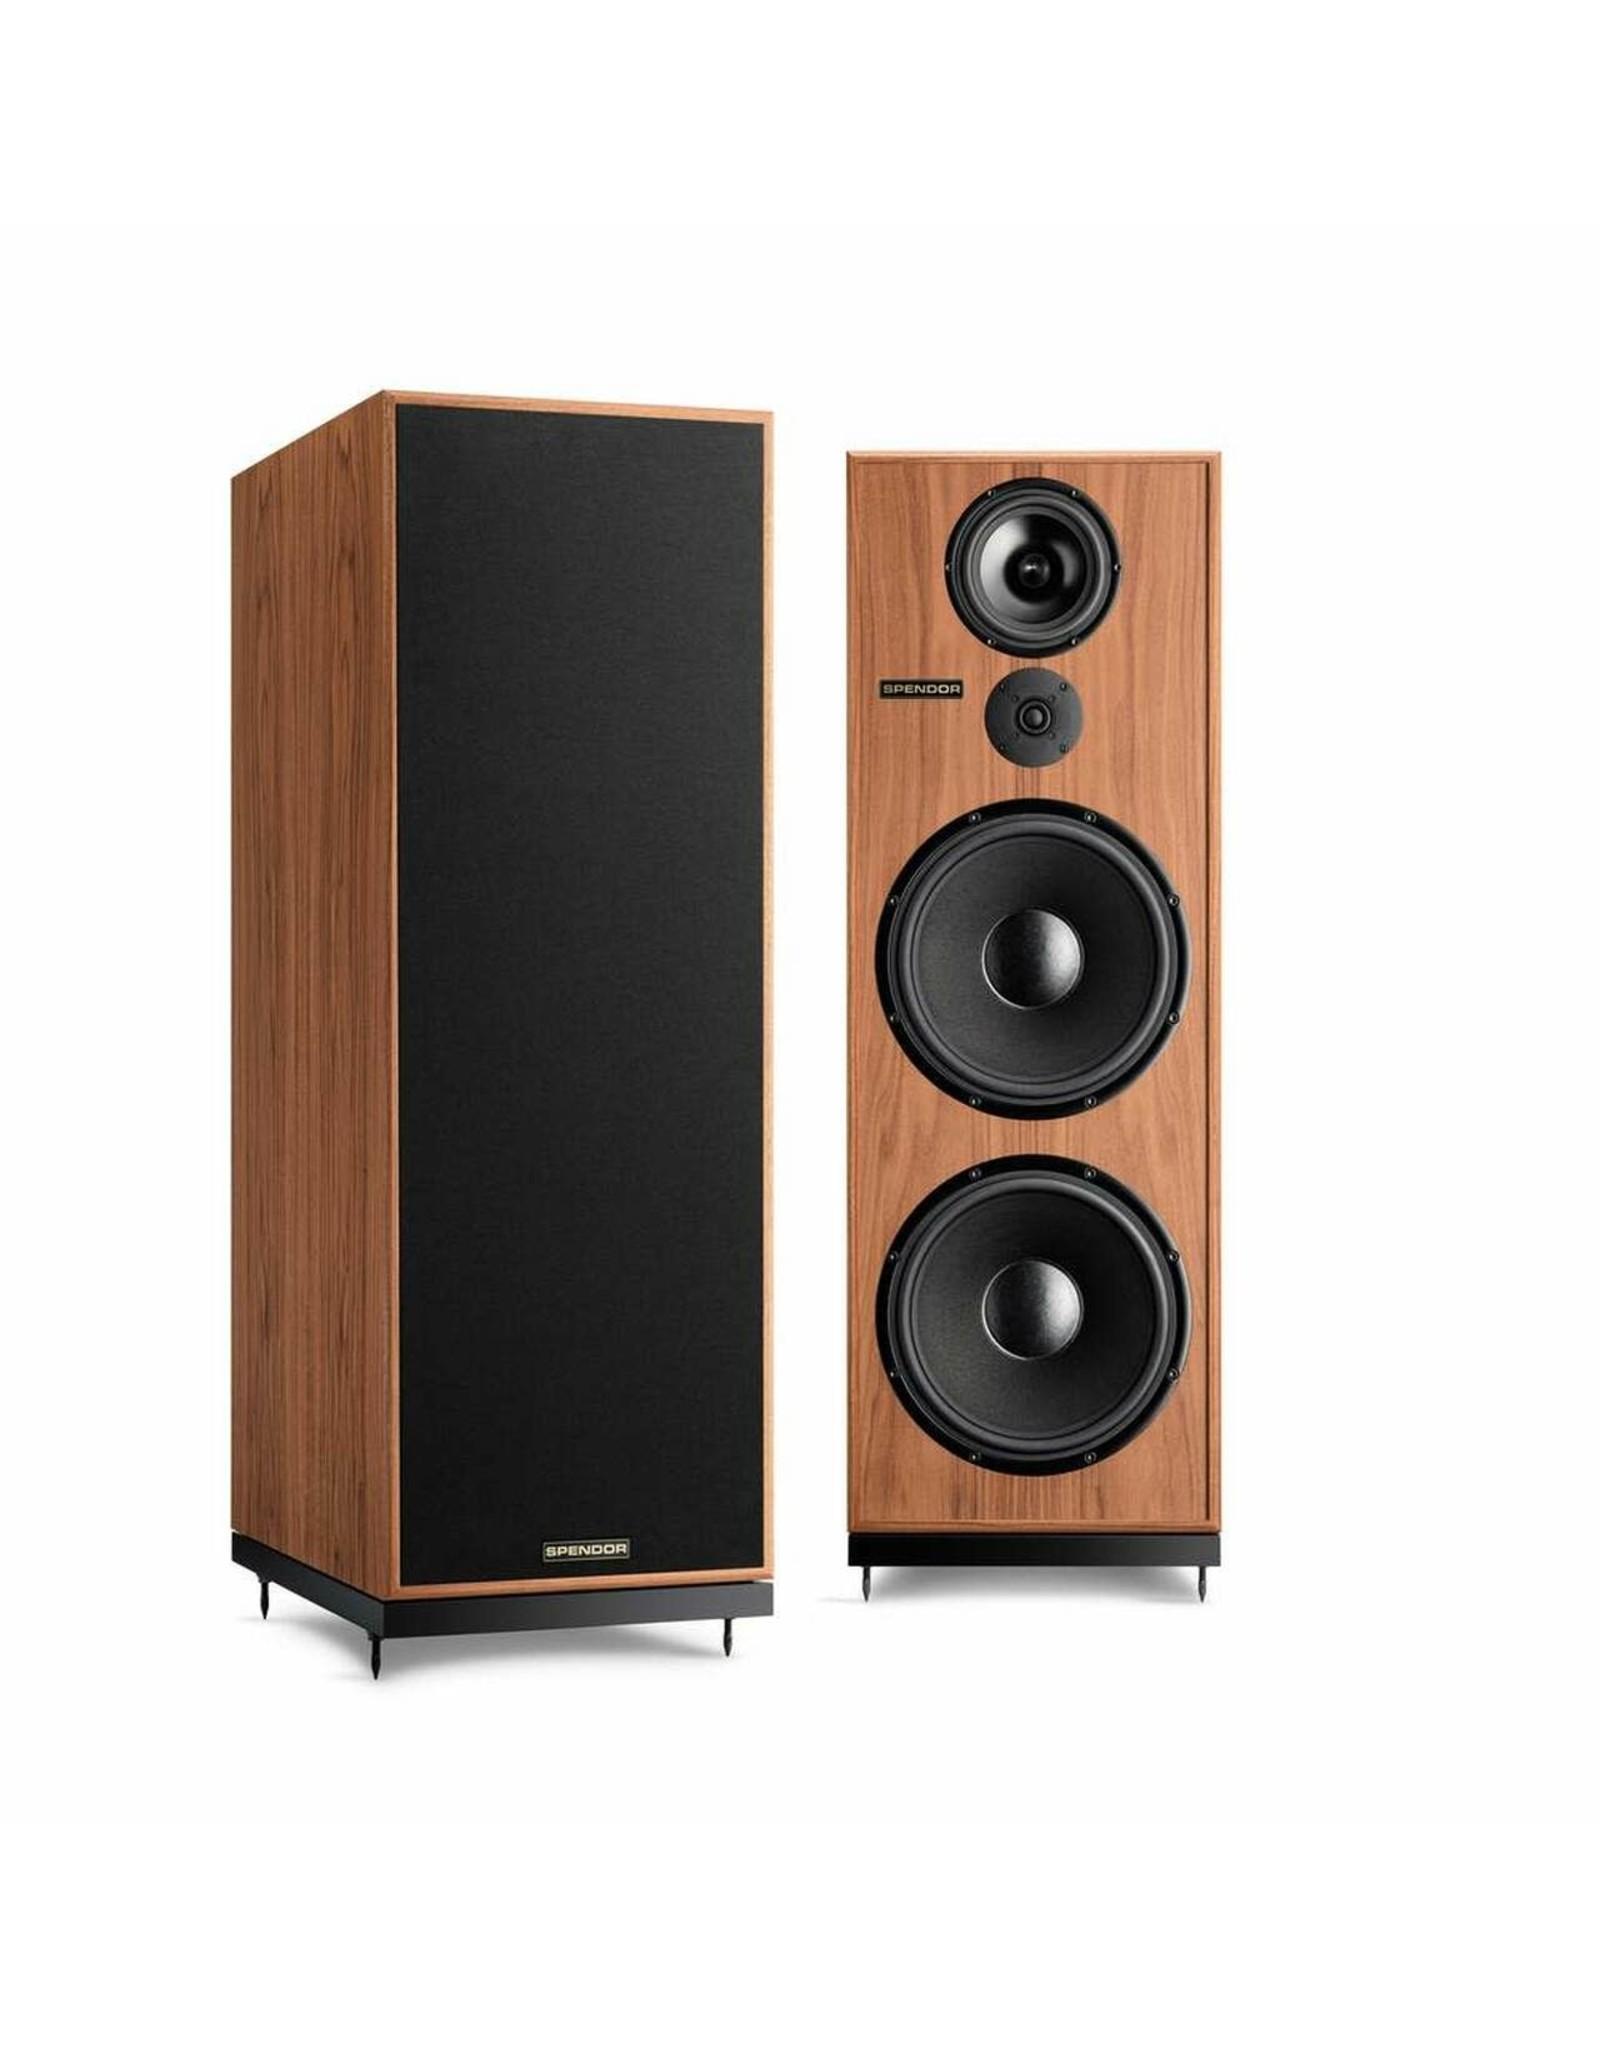 Spendor Spendor Classic 200 Floorstanding Speakers